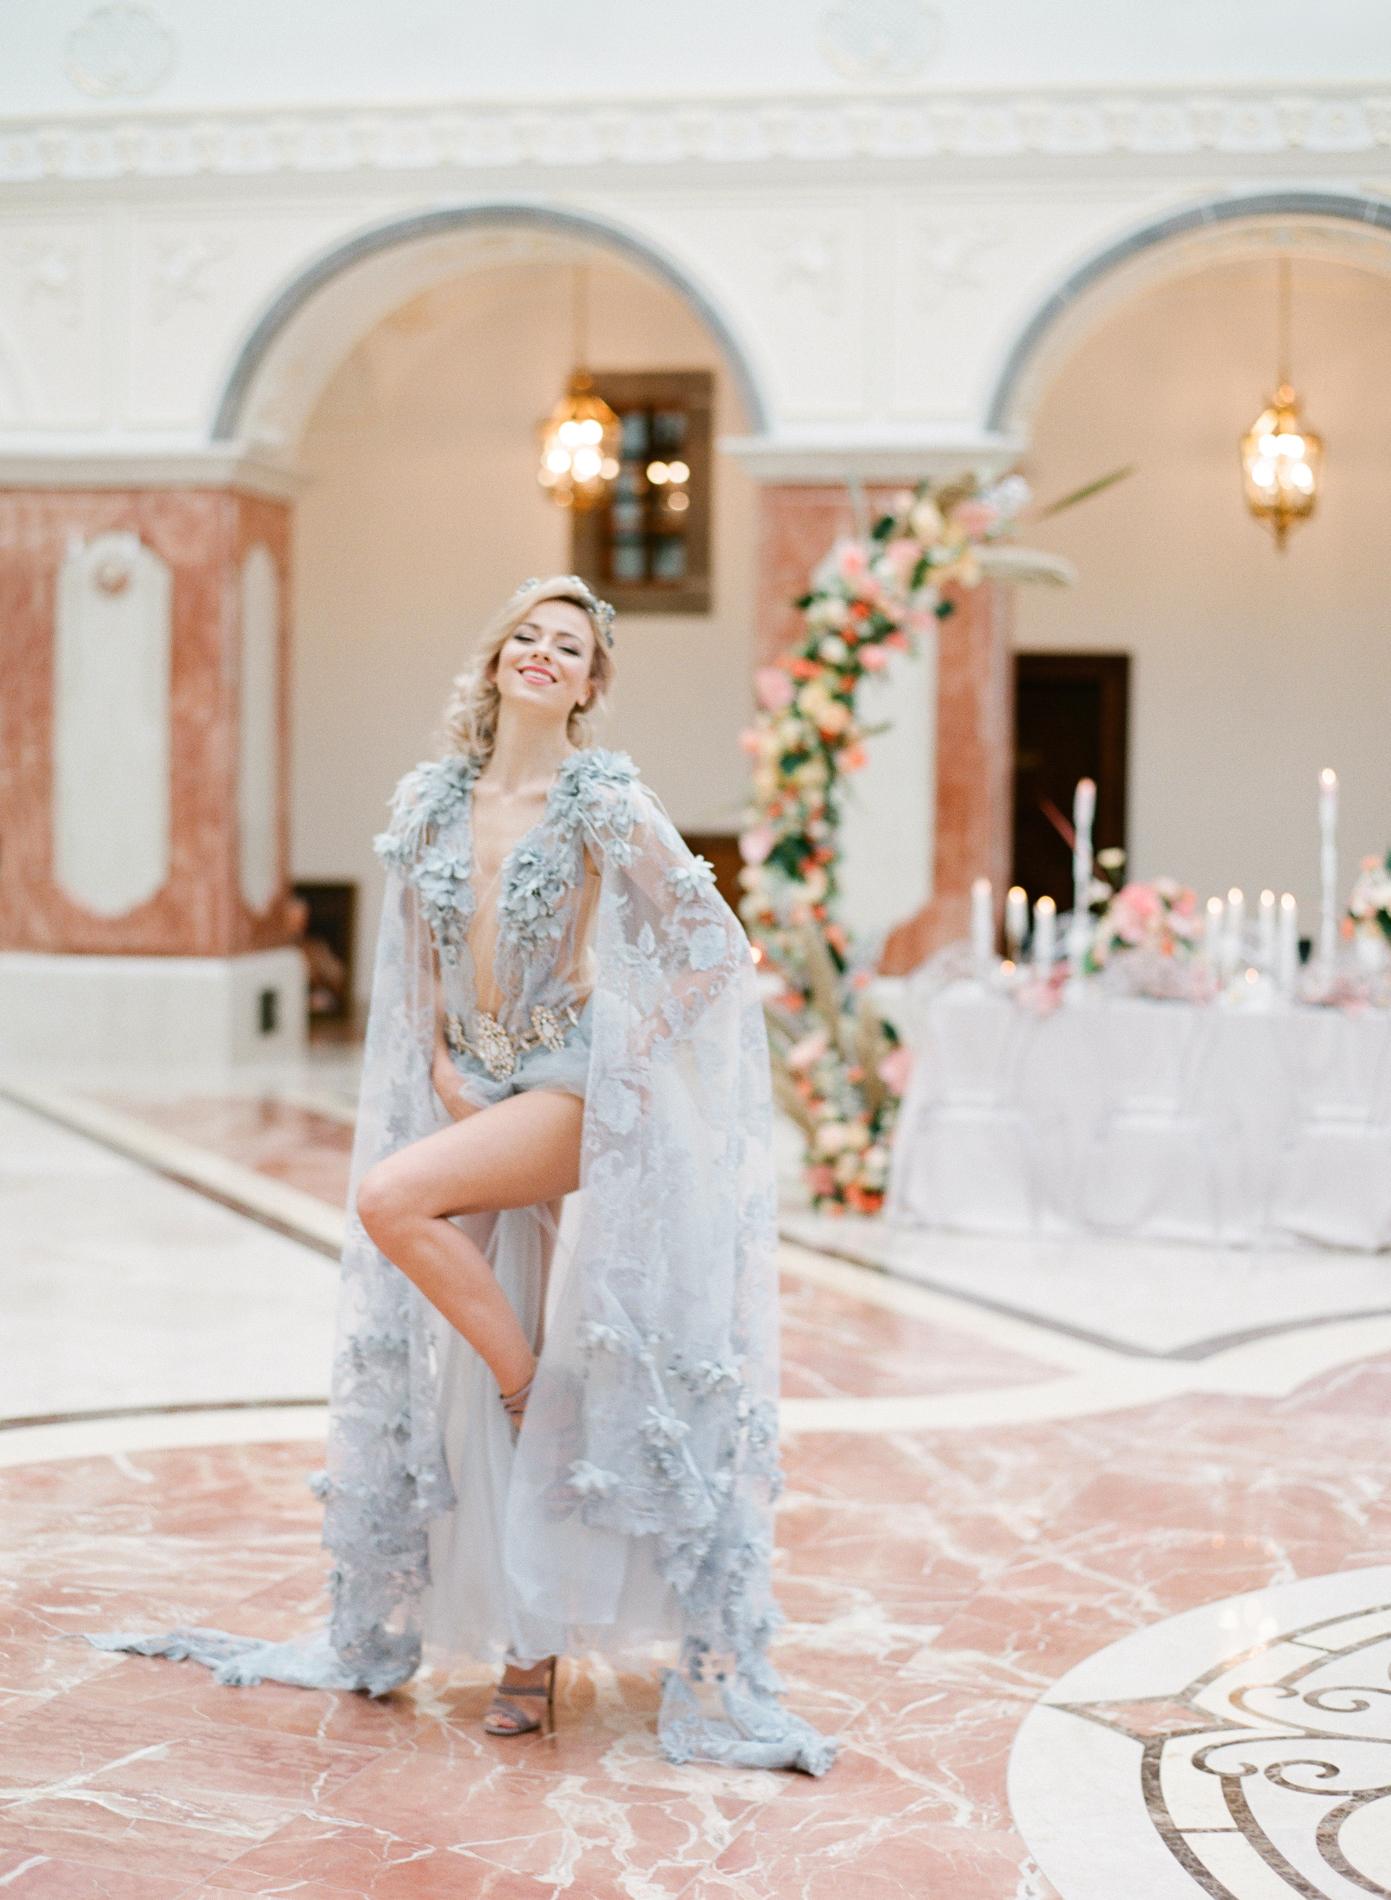 galicia_nueva_wedding_photographer_nikol_bodnarova_italy_wedding_photographer_93.JPG